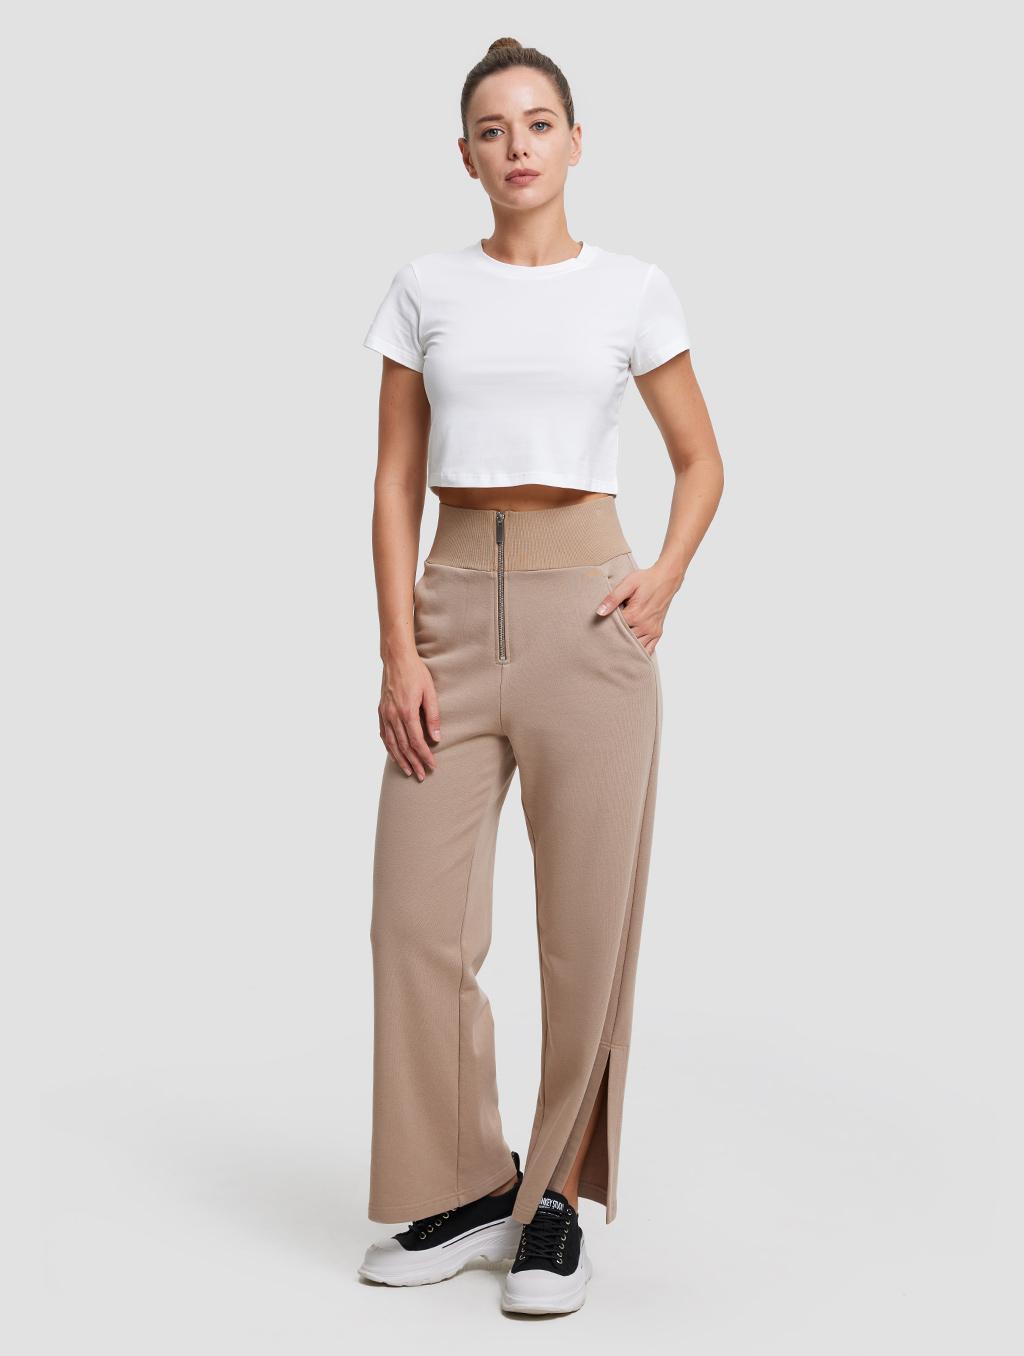 High-waist Threaded Slit Sweatpant- whole body - Caramel